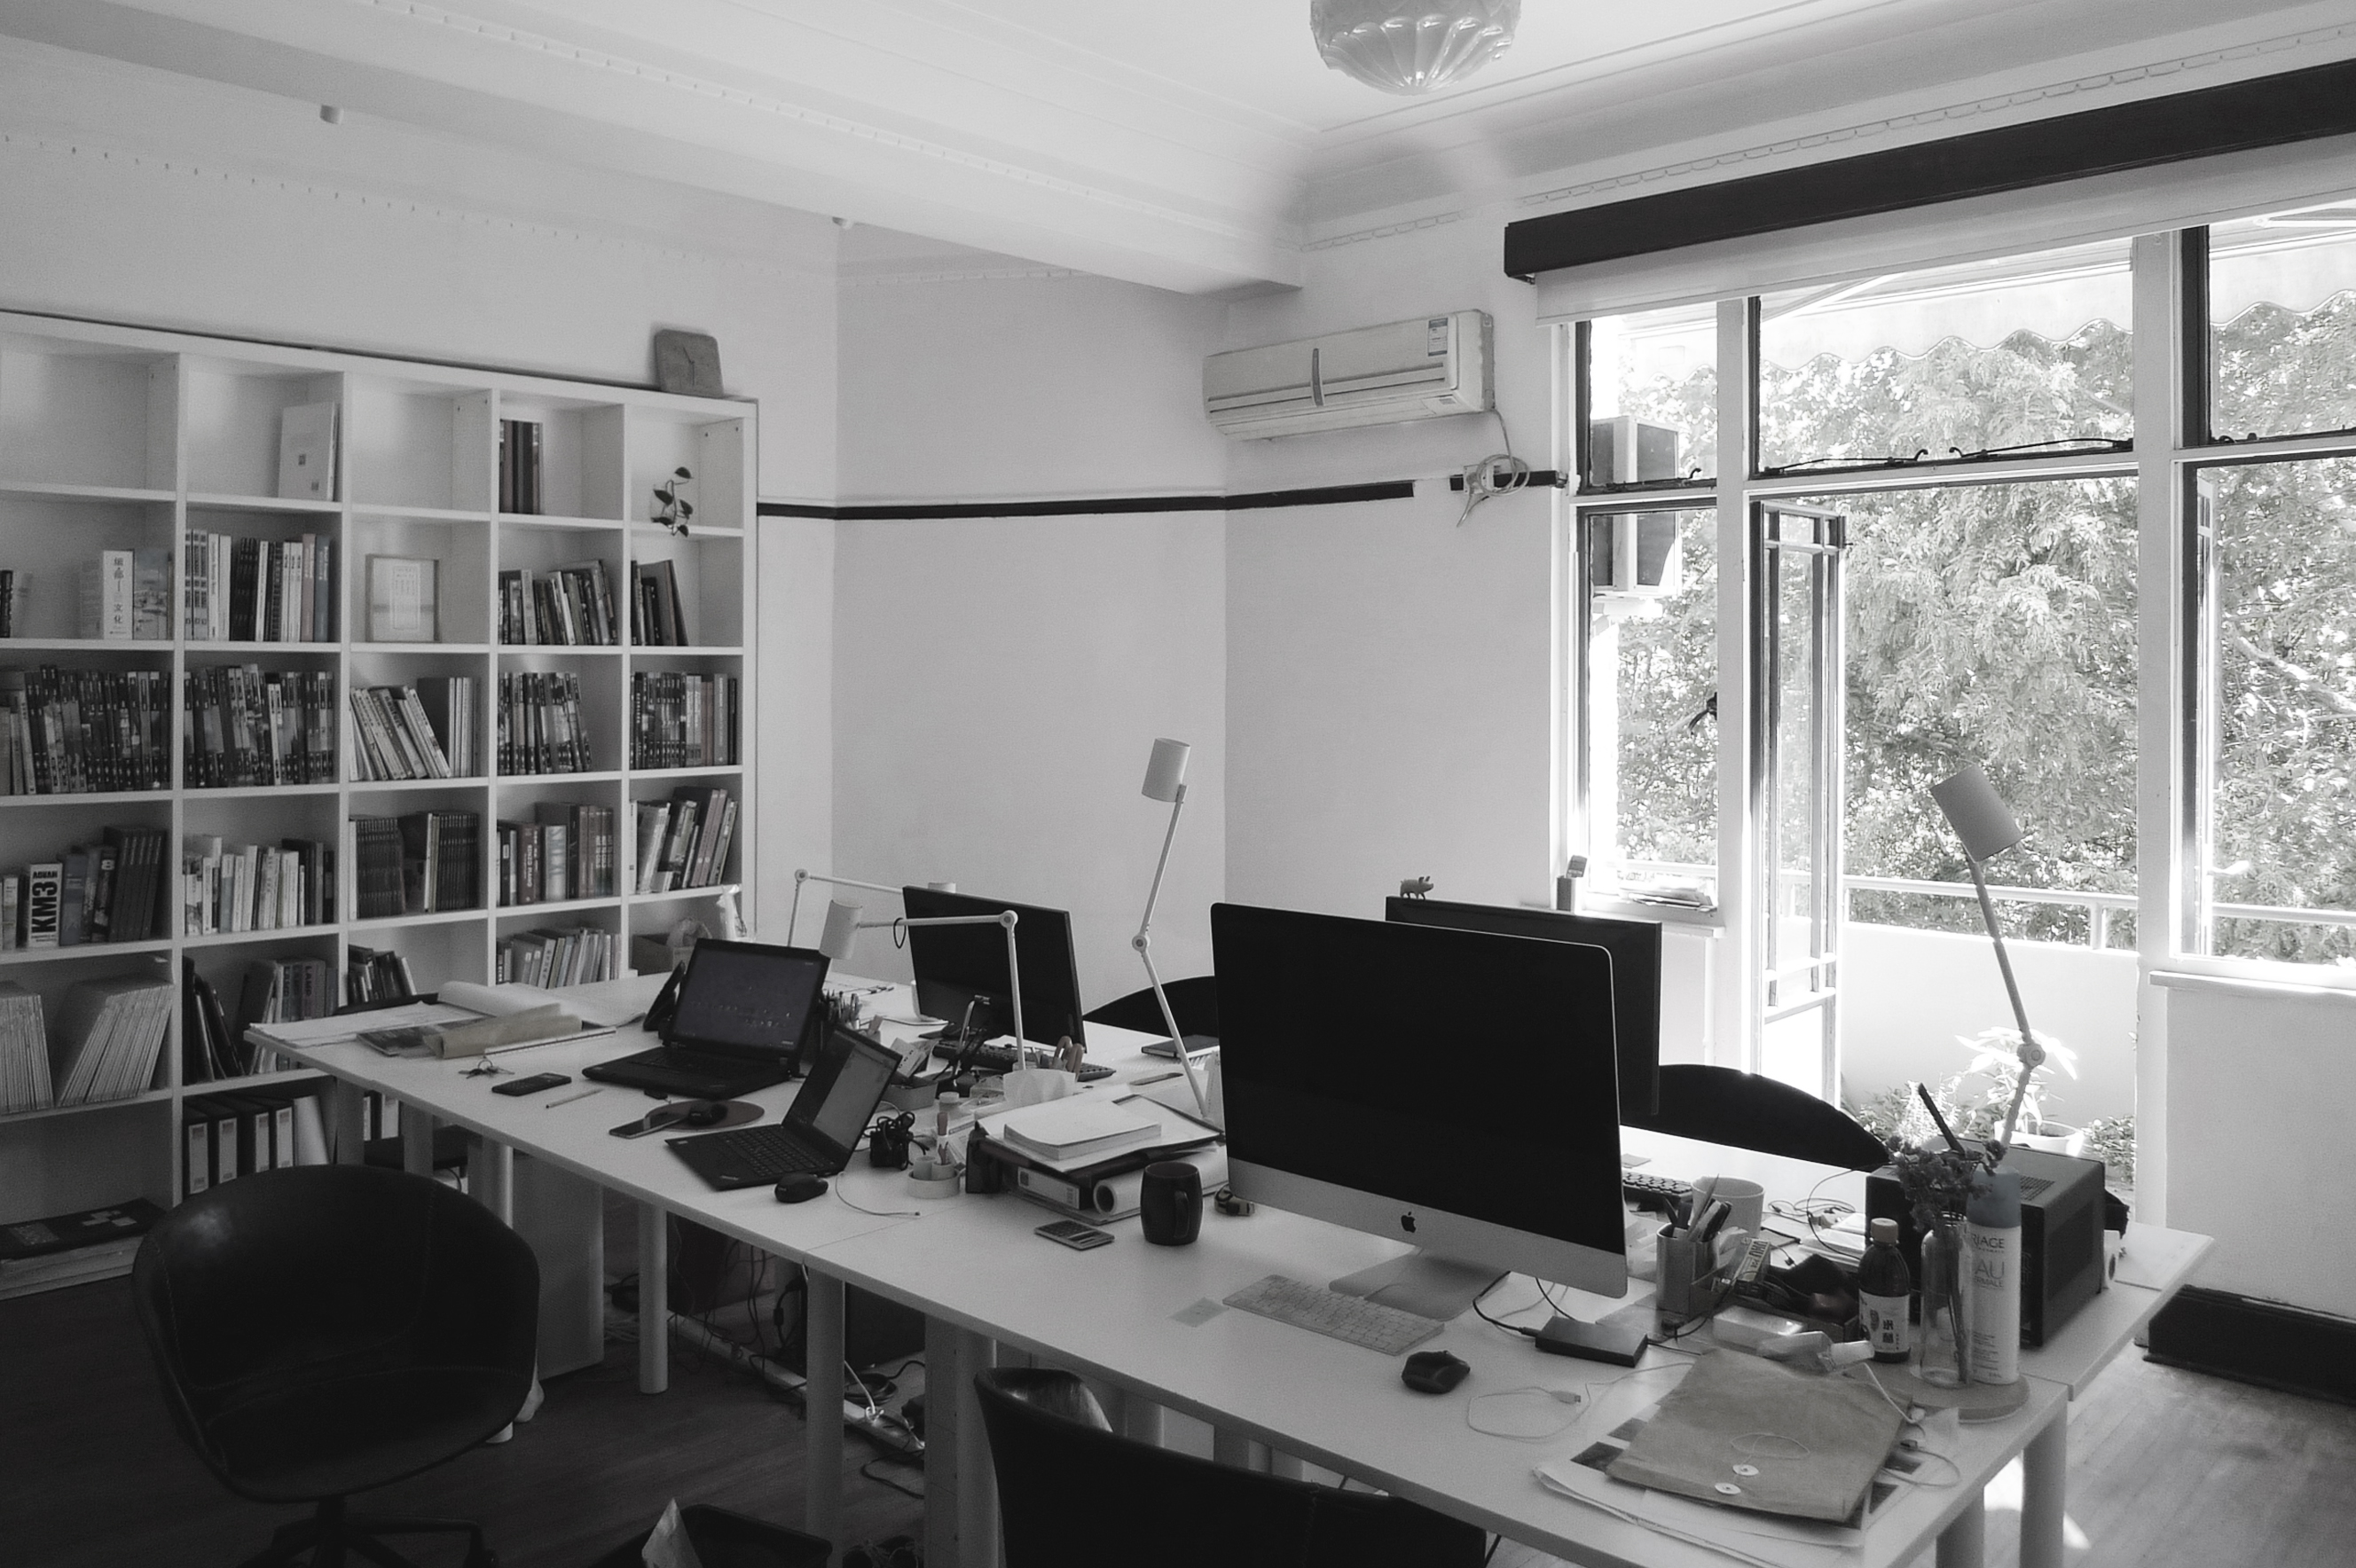 hs_office 02